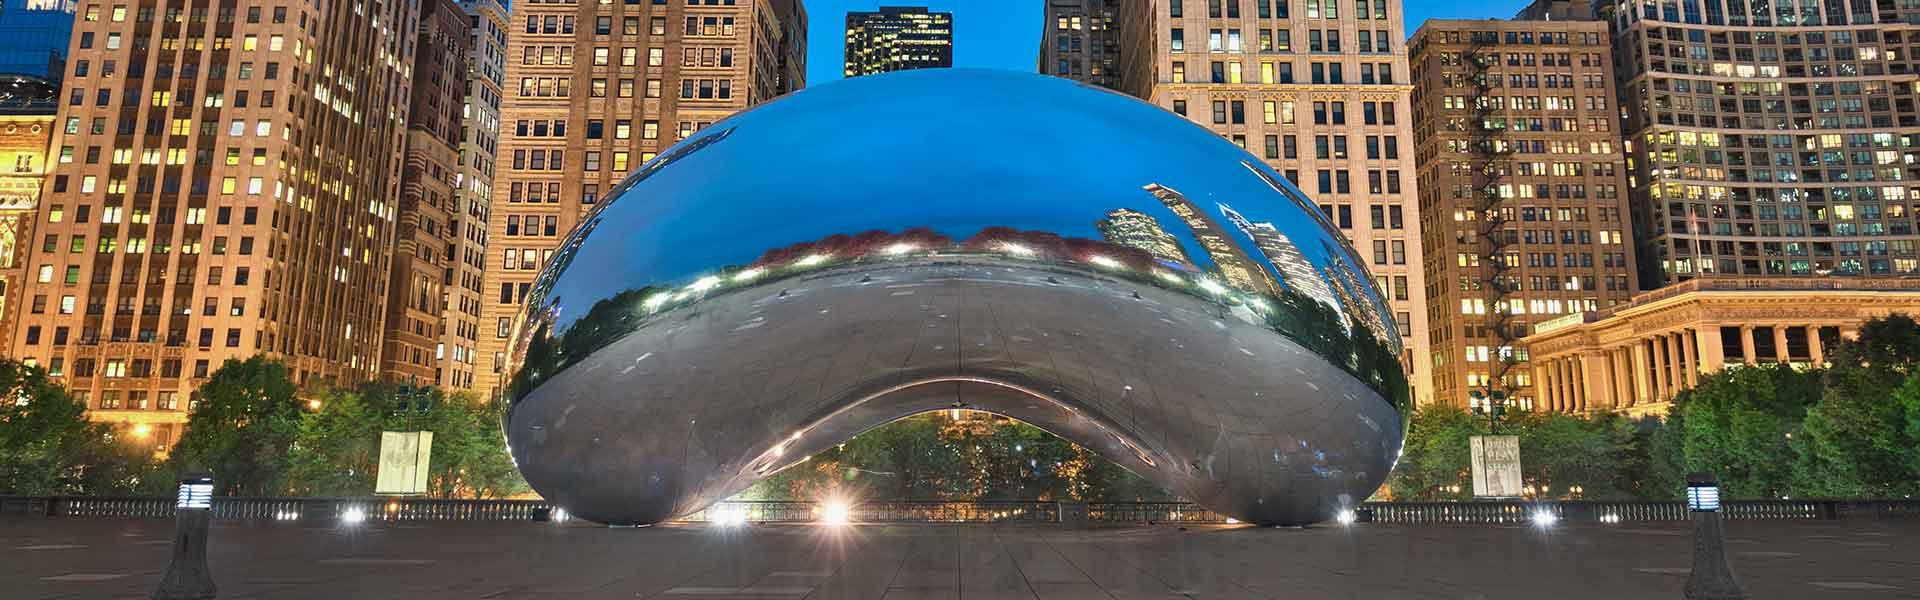 RockfordChristianSchool-Chicago-Banner-2020